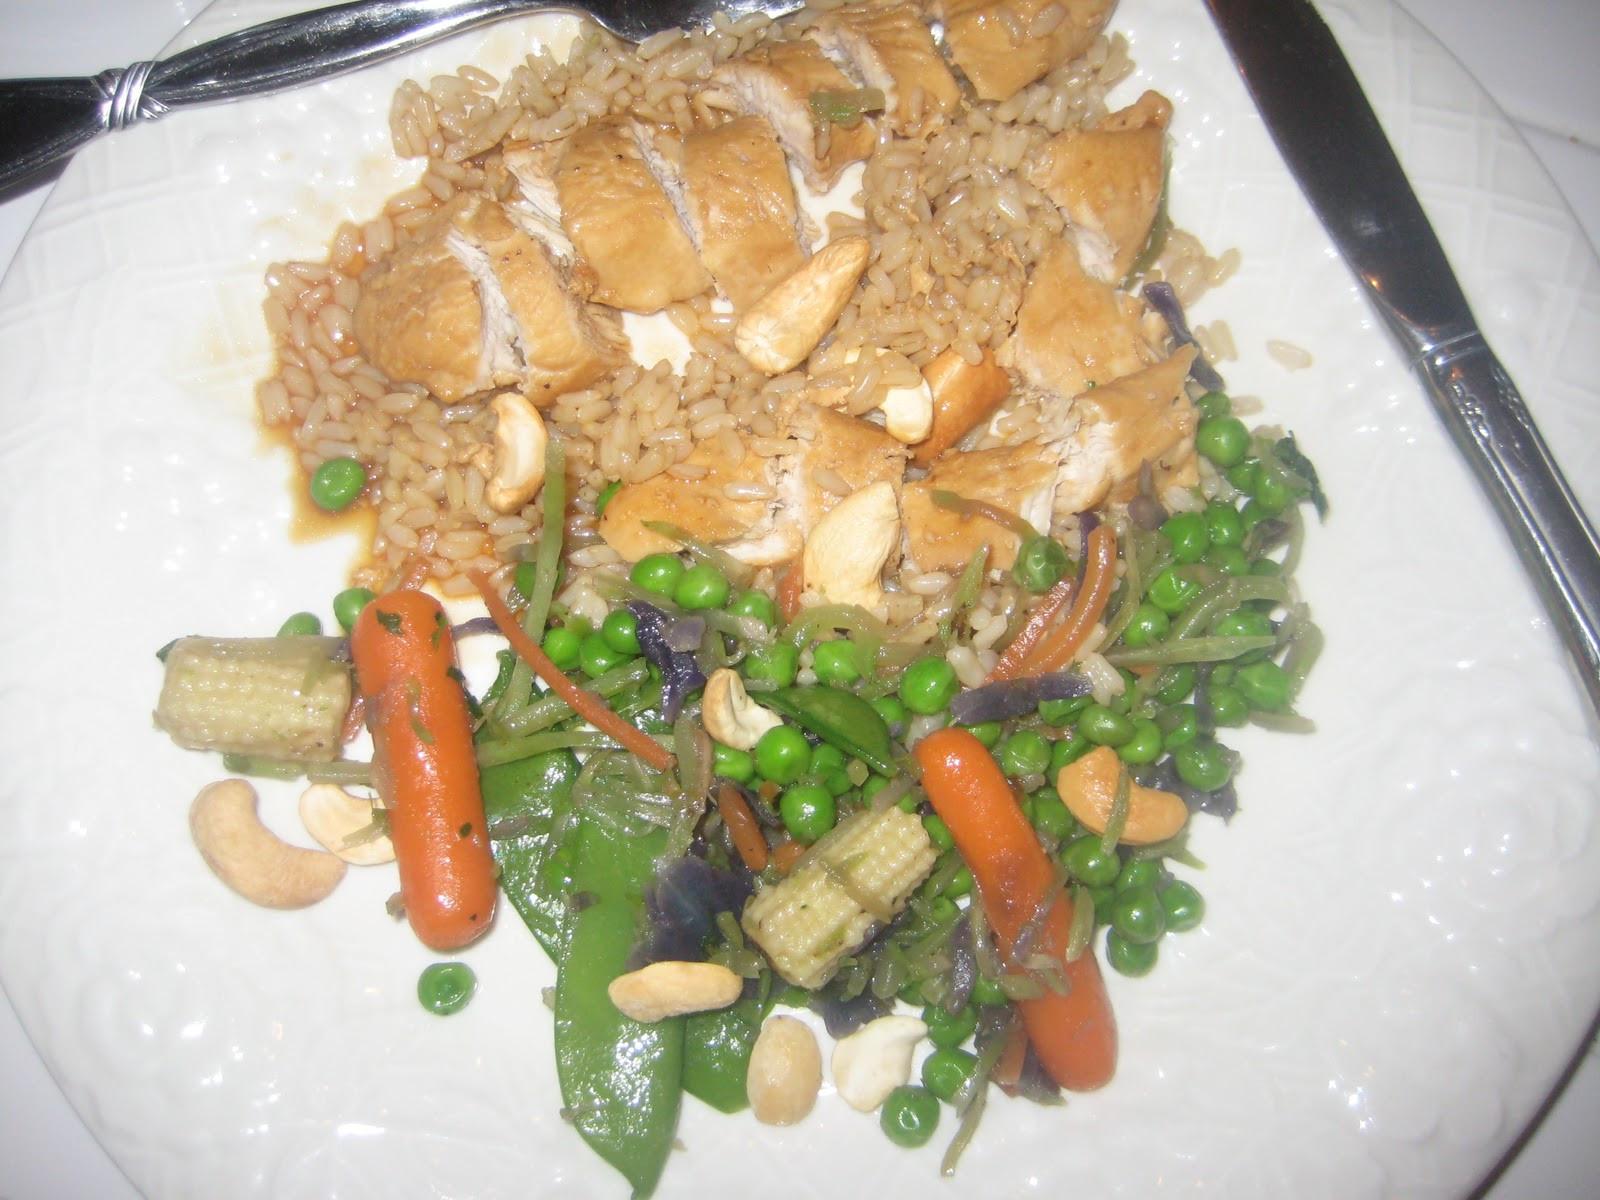 Diabetic Stir Fry Recipes  Our Diabetic Warrior Chicken Stir Fry Recipe